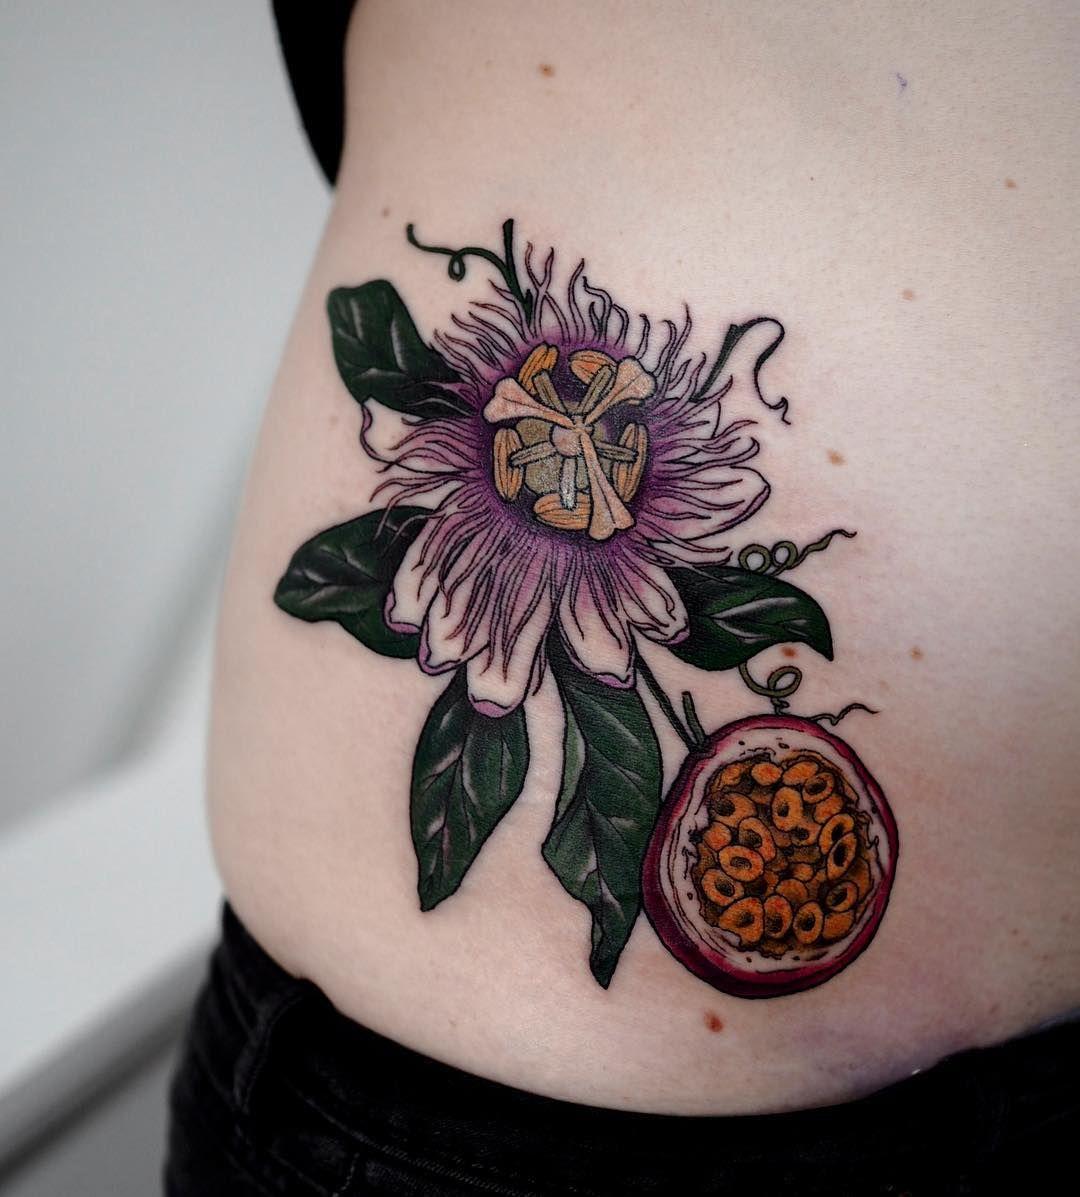 Sophia Baughan Passionflower Tattoo Fruit Tattoo Body Art Tattoos Tattoos